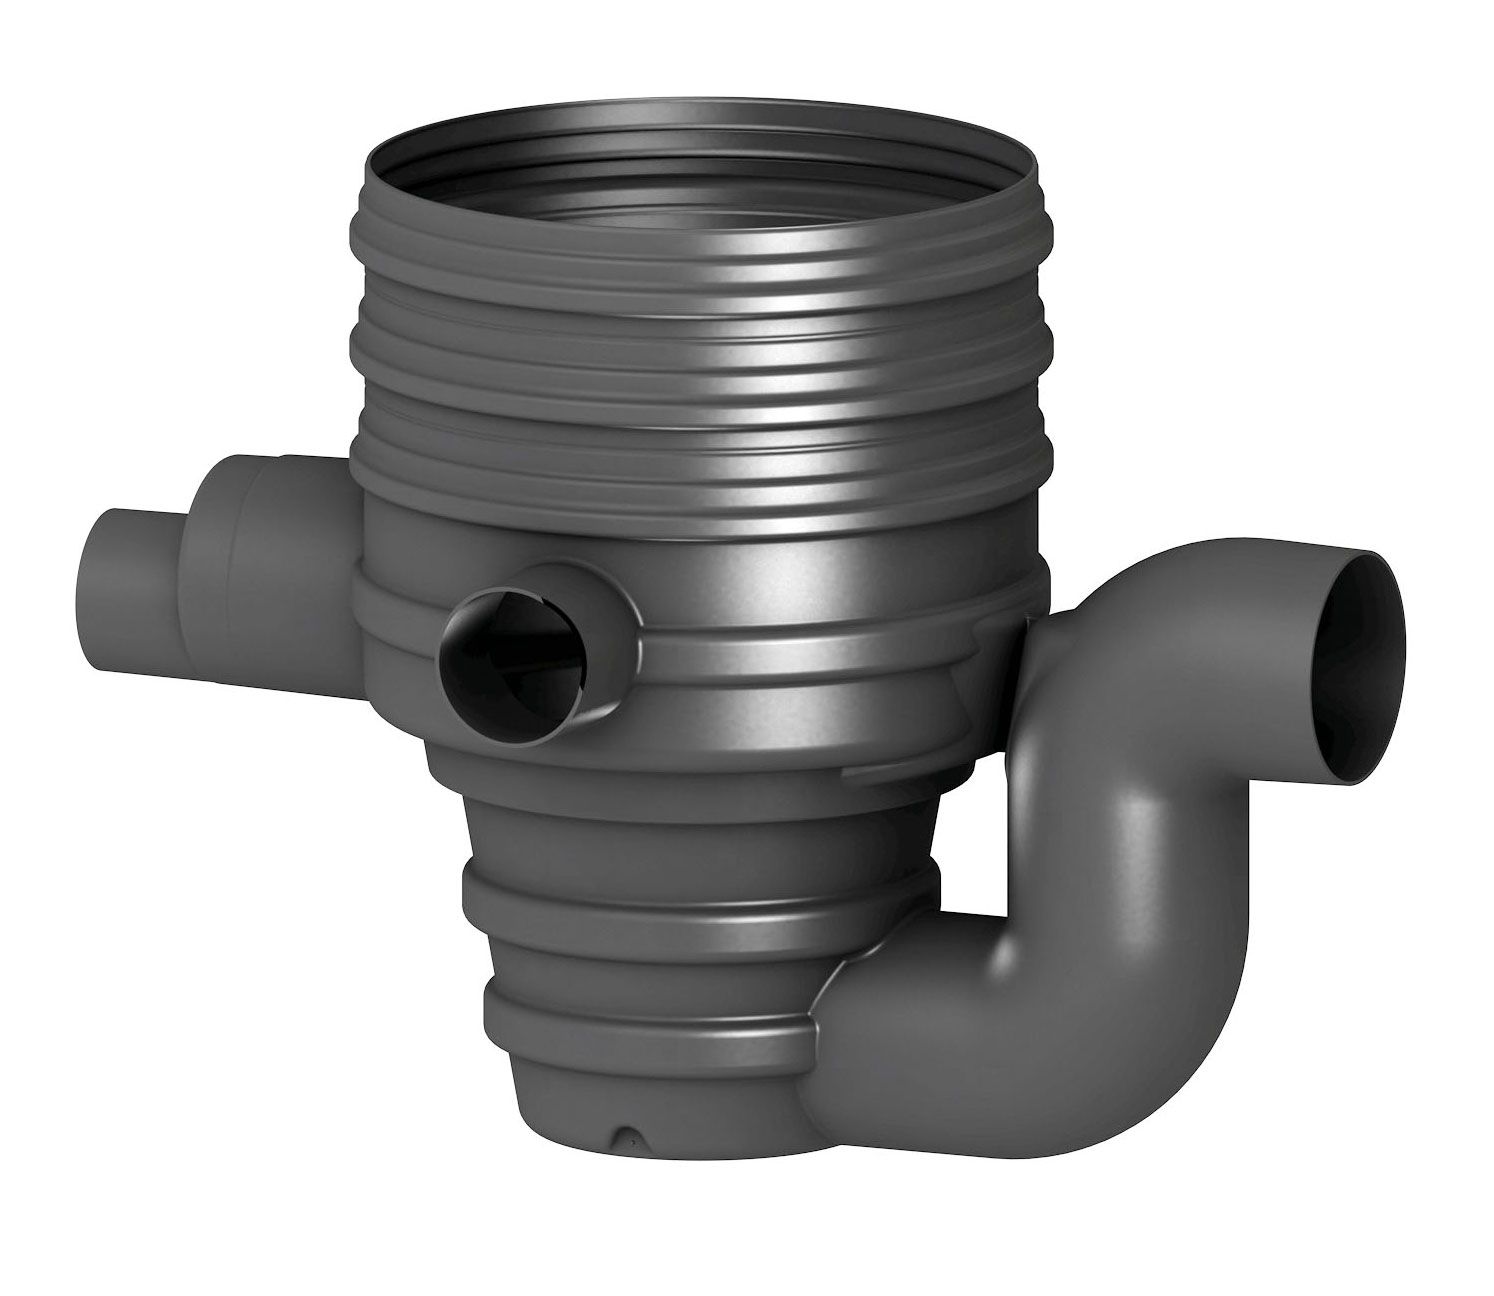 drainstar filter extern begehbar teleskop graf 340143 bei. Black Bedroom Furniture Sets. Home Design Ideas